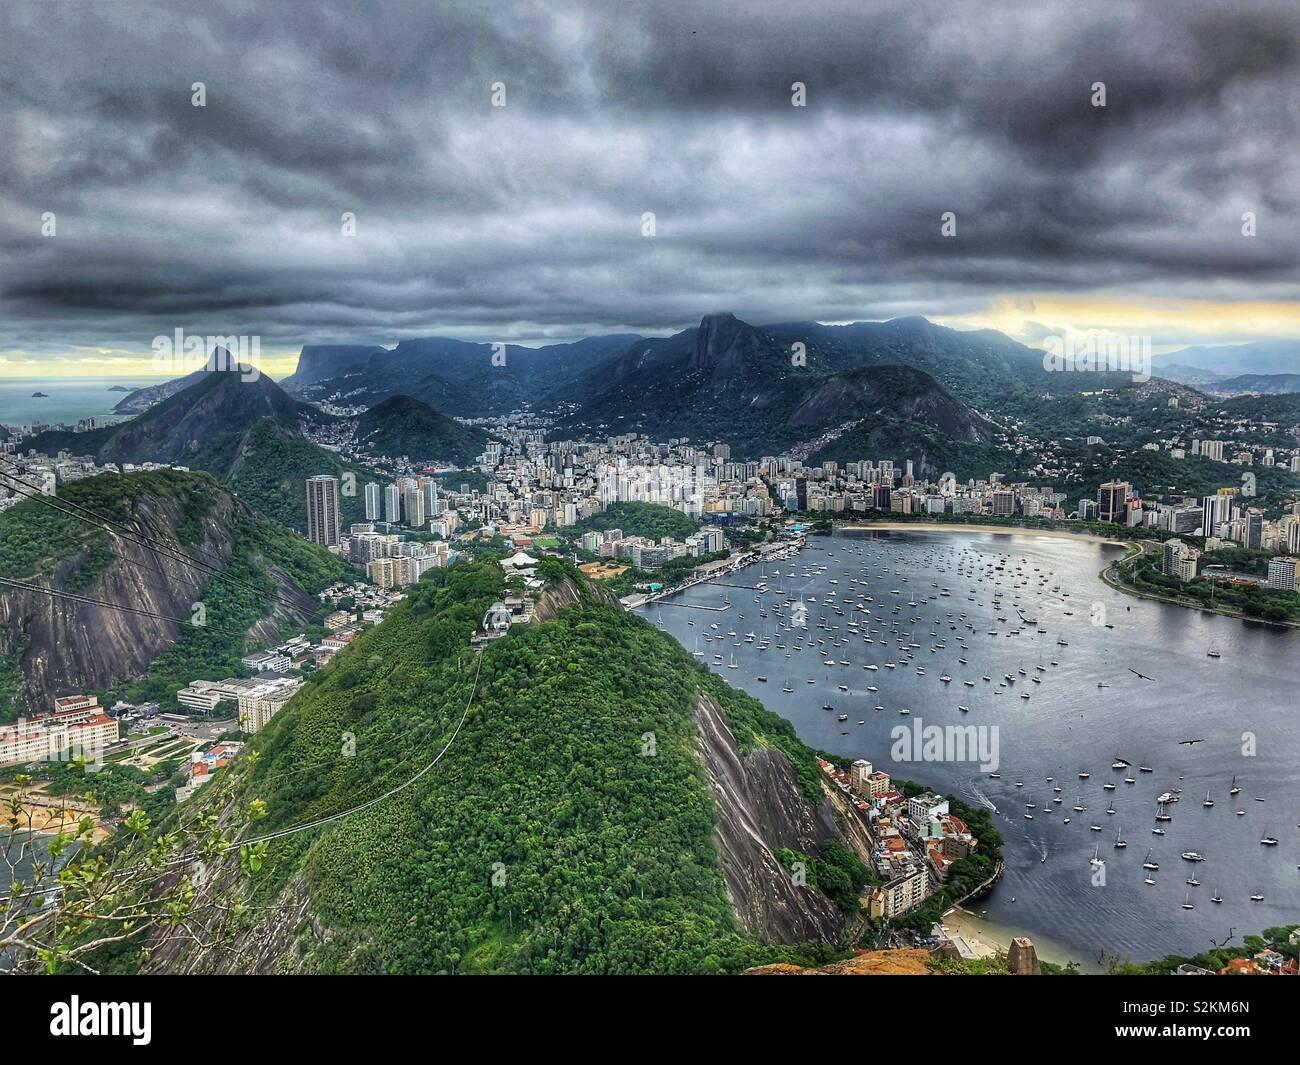 Cloudy skies over Rio de Janeiro, Brazil. - Stock Image